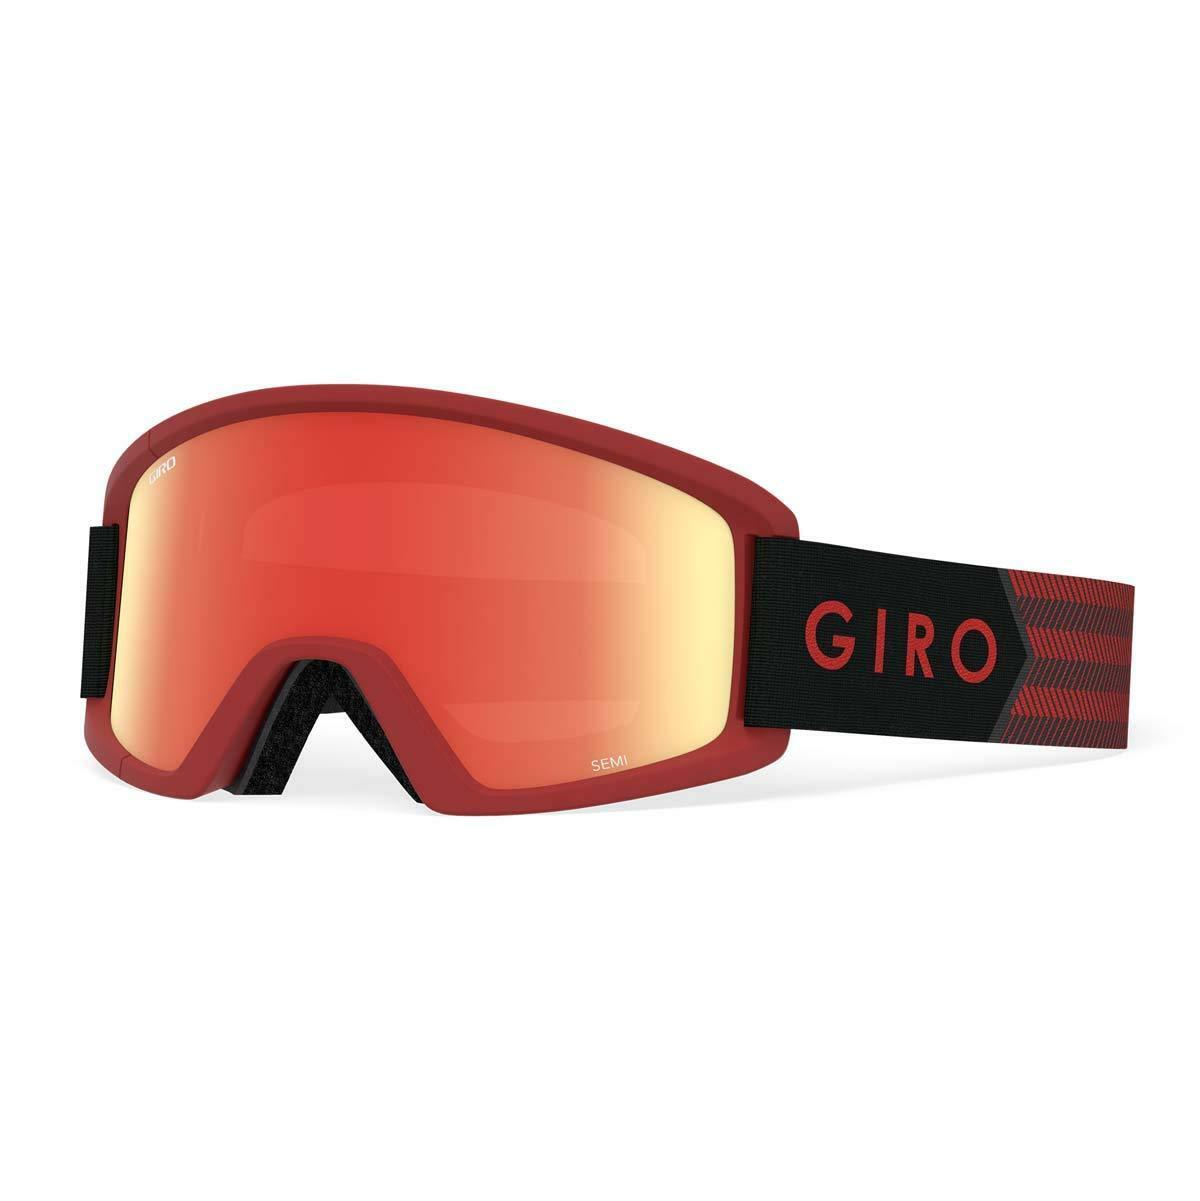 Giro Semi Snow Goggles Dark Red Sierra - Amber Scarlet Yellow